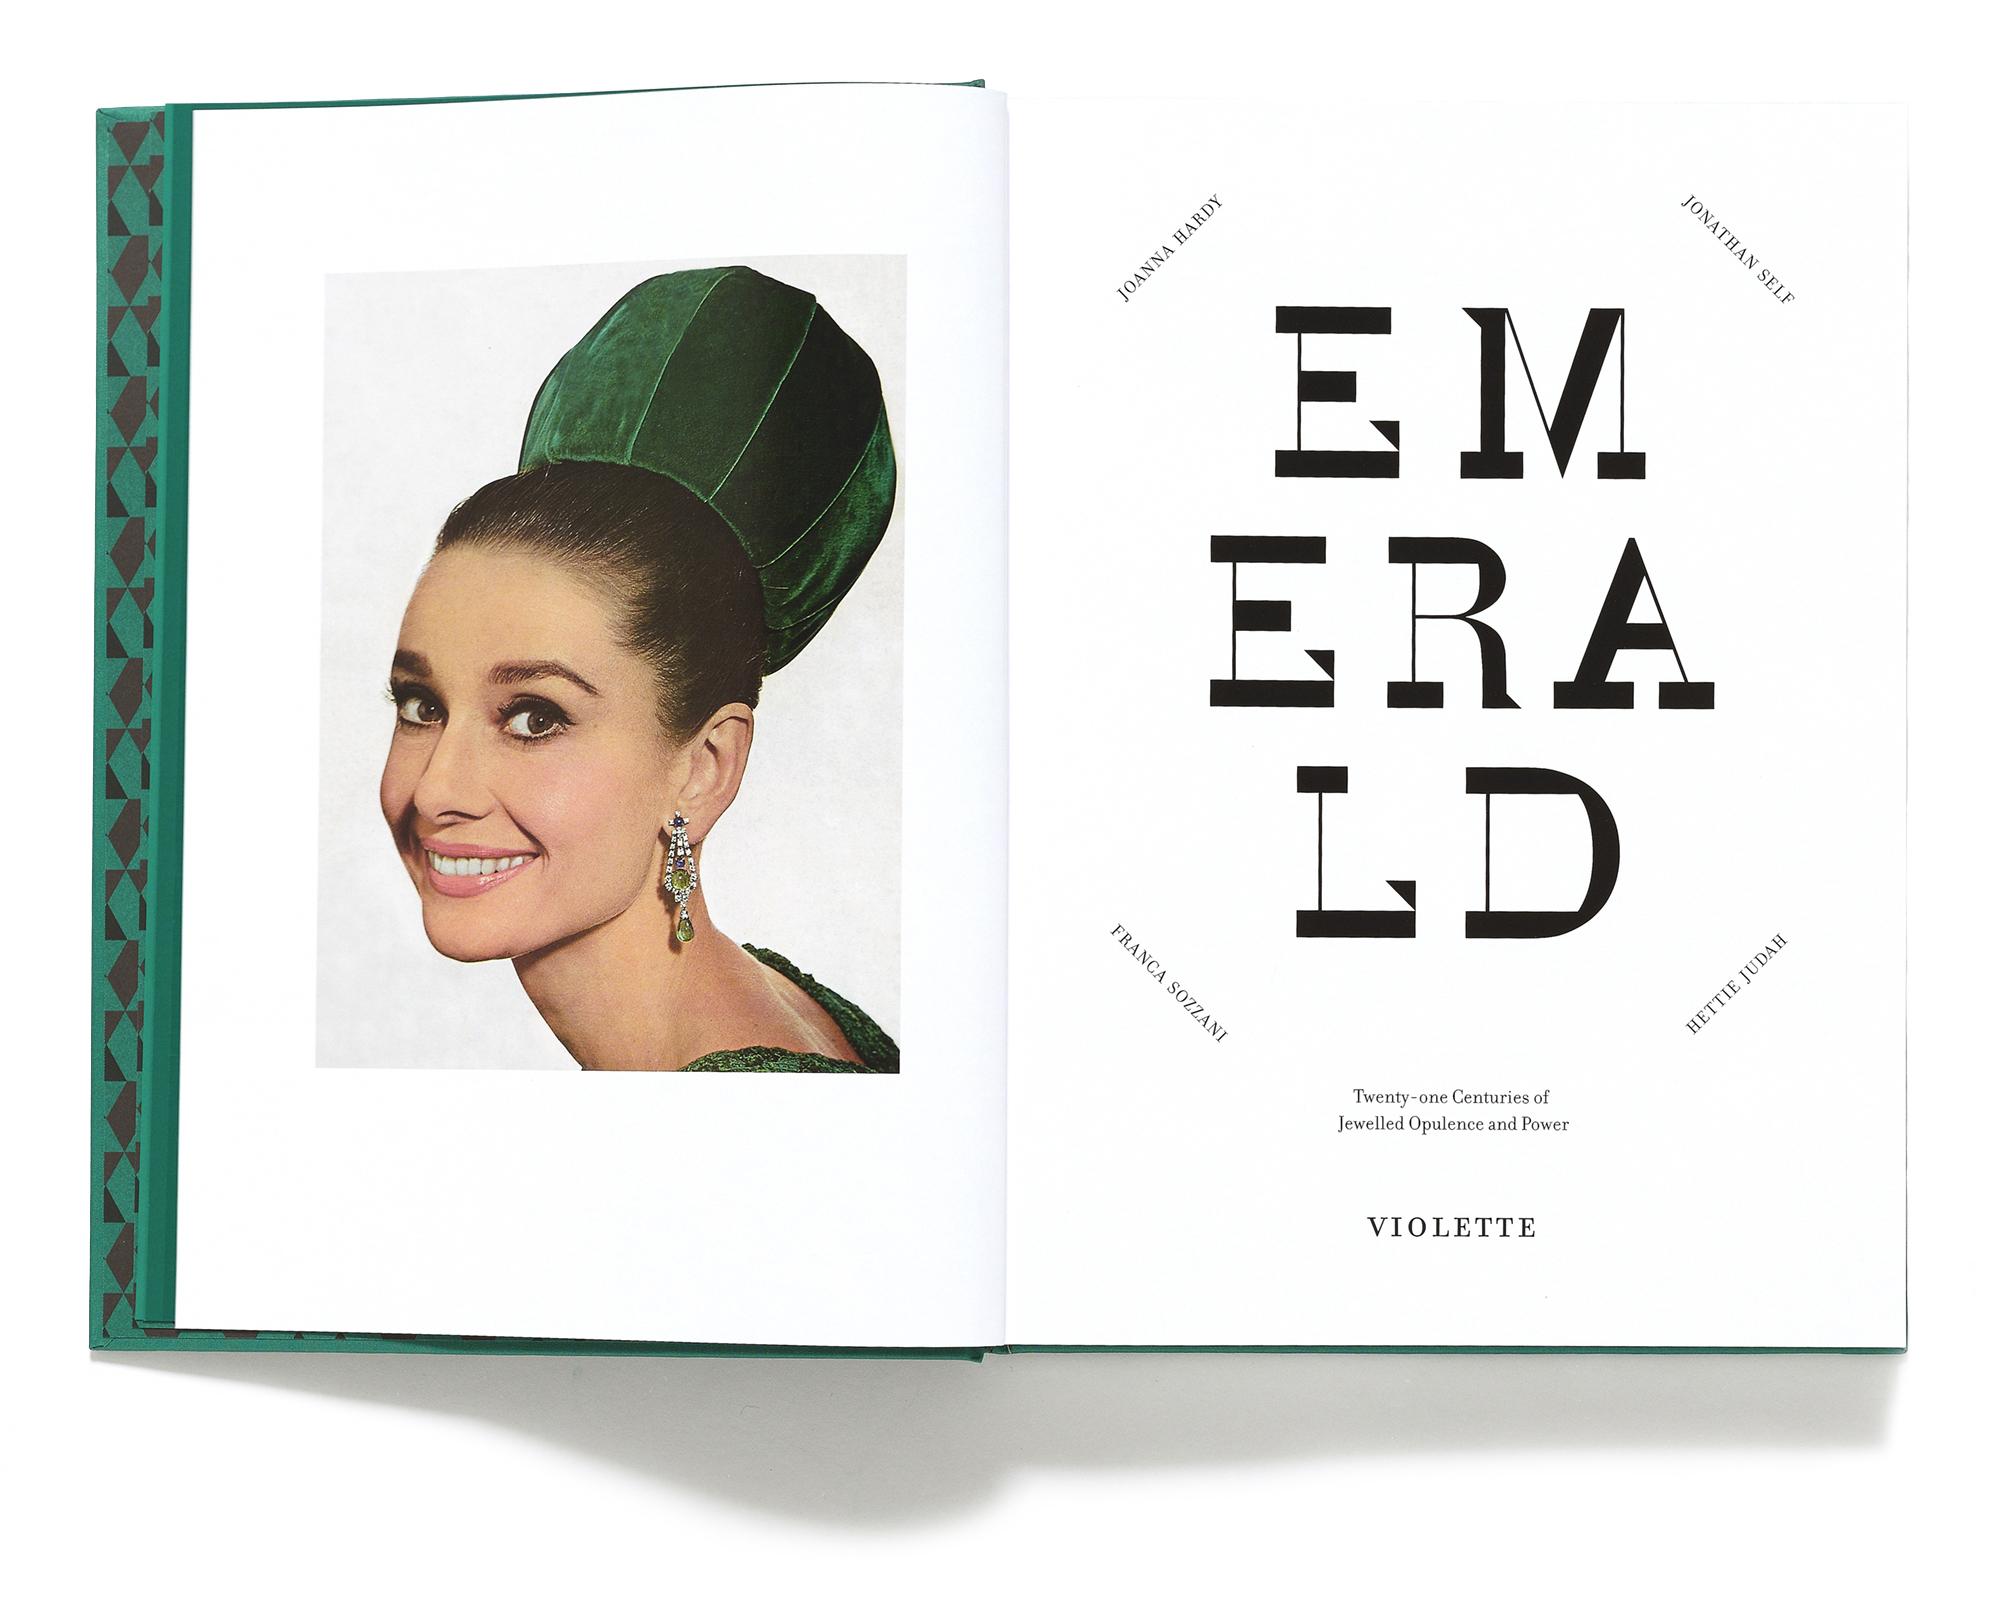 Emerald_Violette Editions_14.jpg